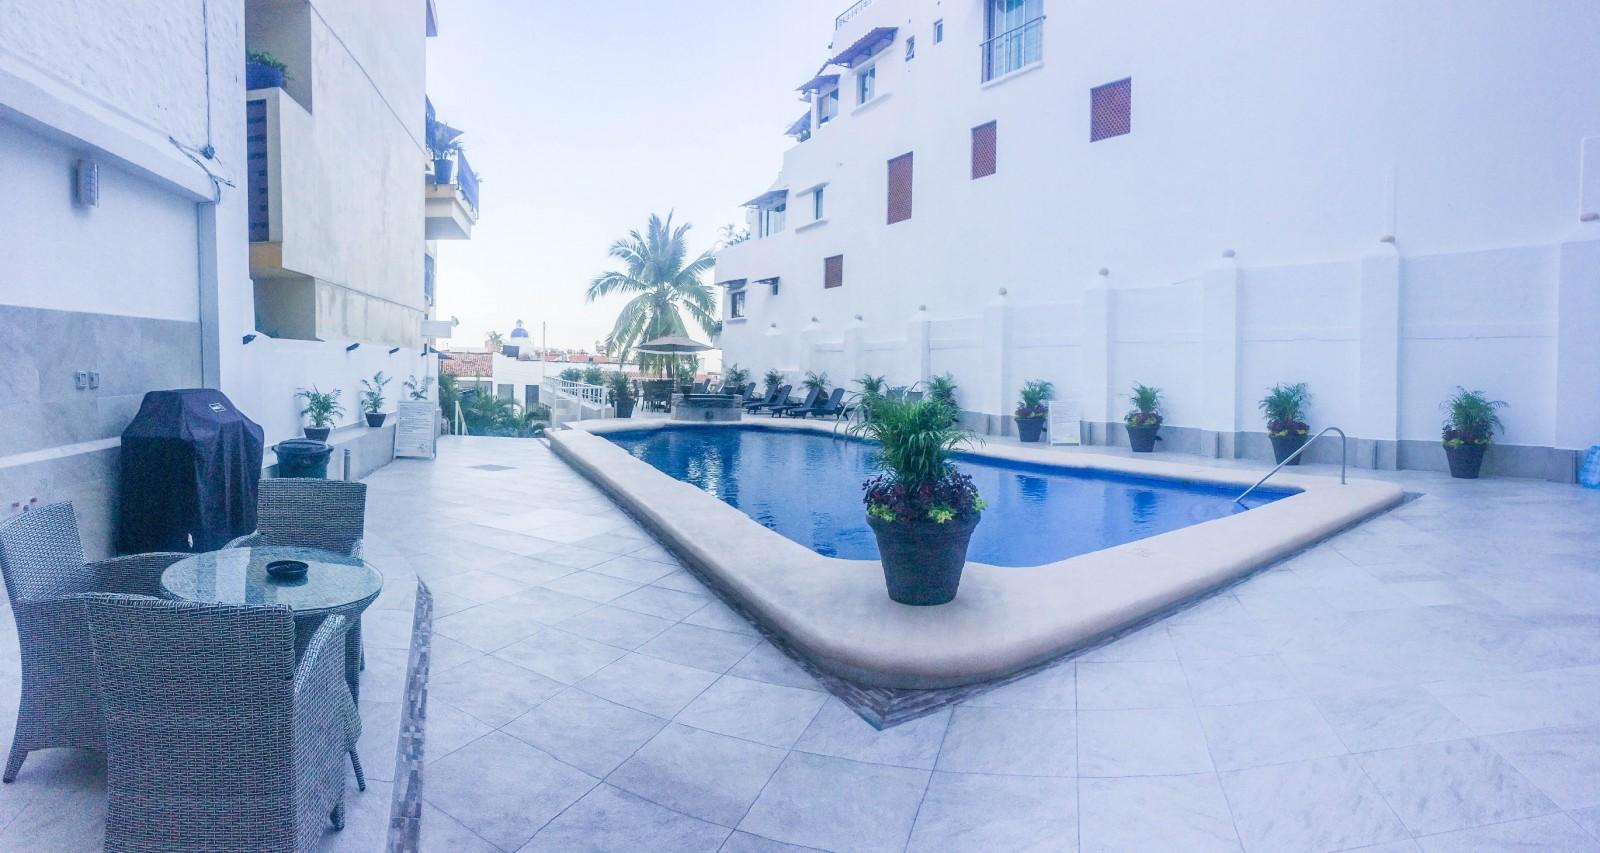 Boana Torre Malibu Puerto Vallarta Mexico Best Price Guarantee Voucher Hotel West Lake Jogja Photo